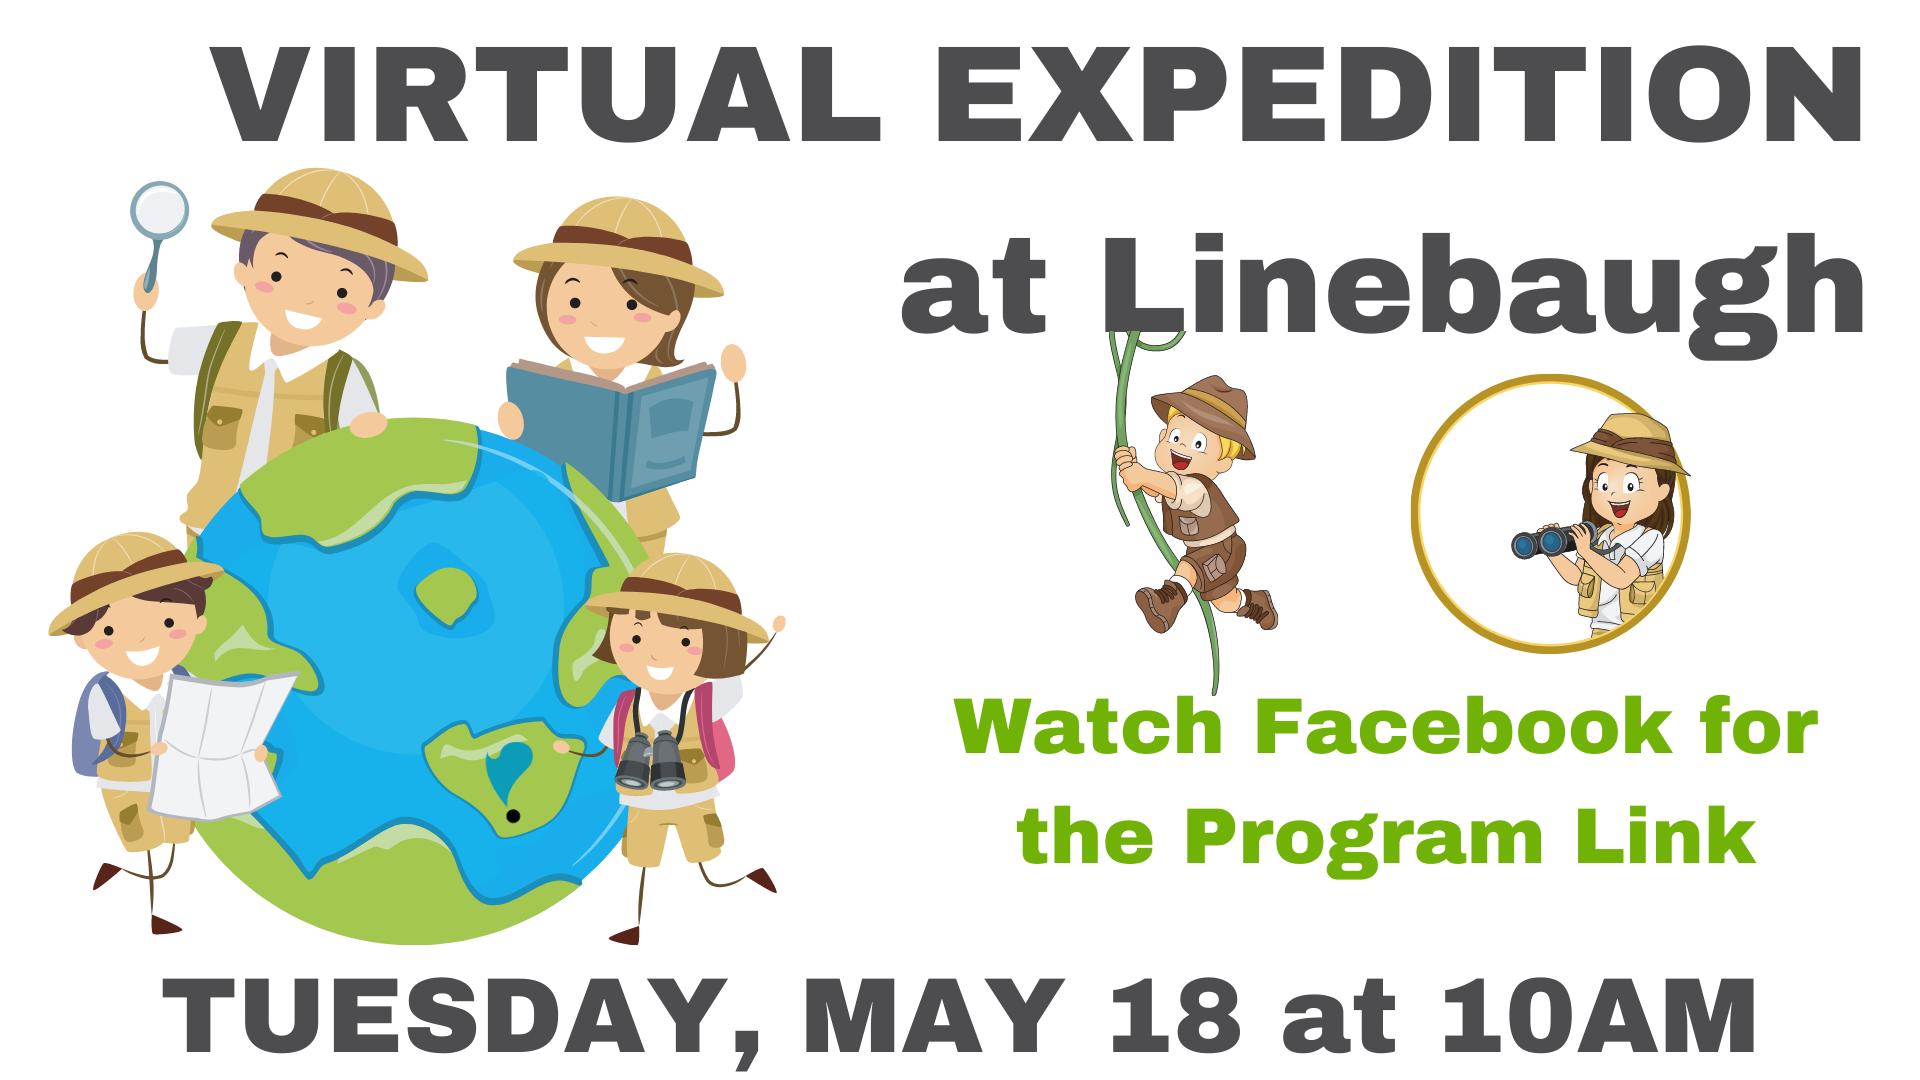 Summer Virtual Expedition at Linebaugh